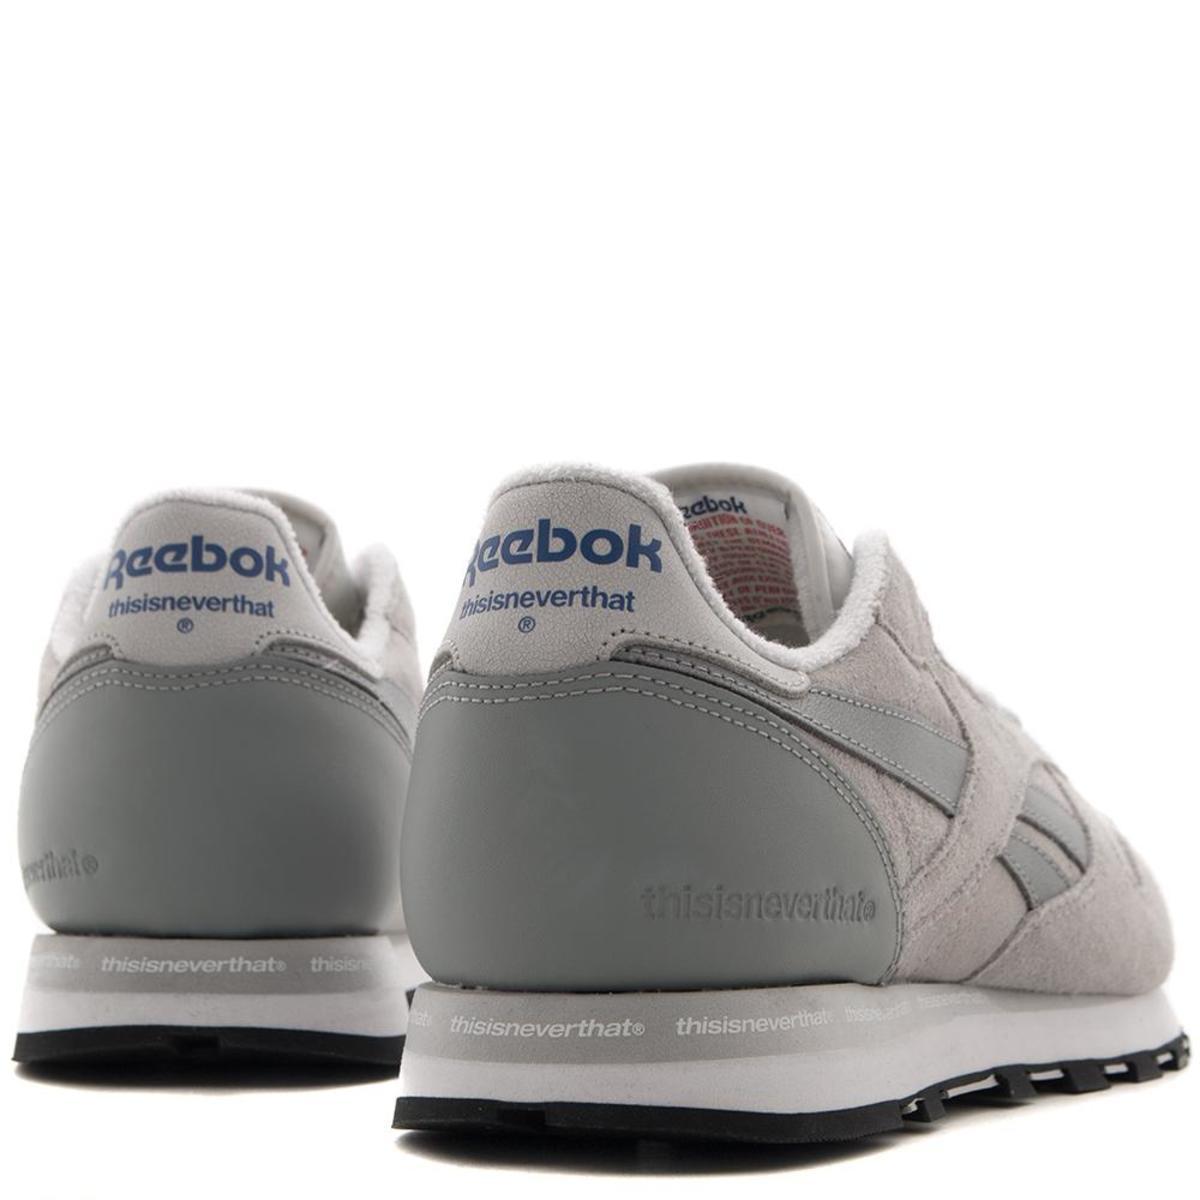 6353ecb2cb58 Reebok Affiliates x Thisisneverthat CL Leather - Steel